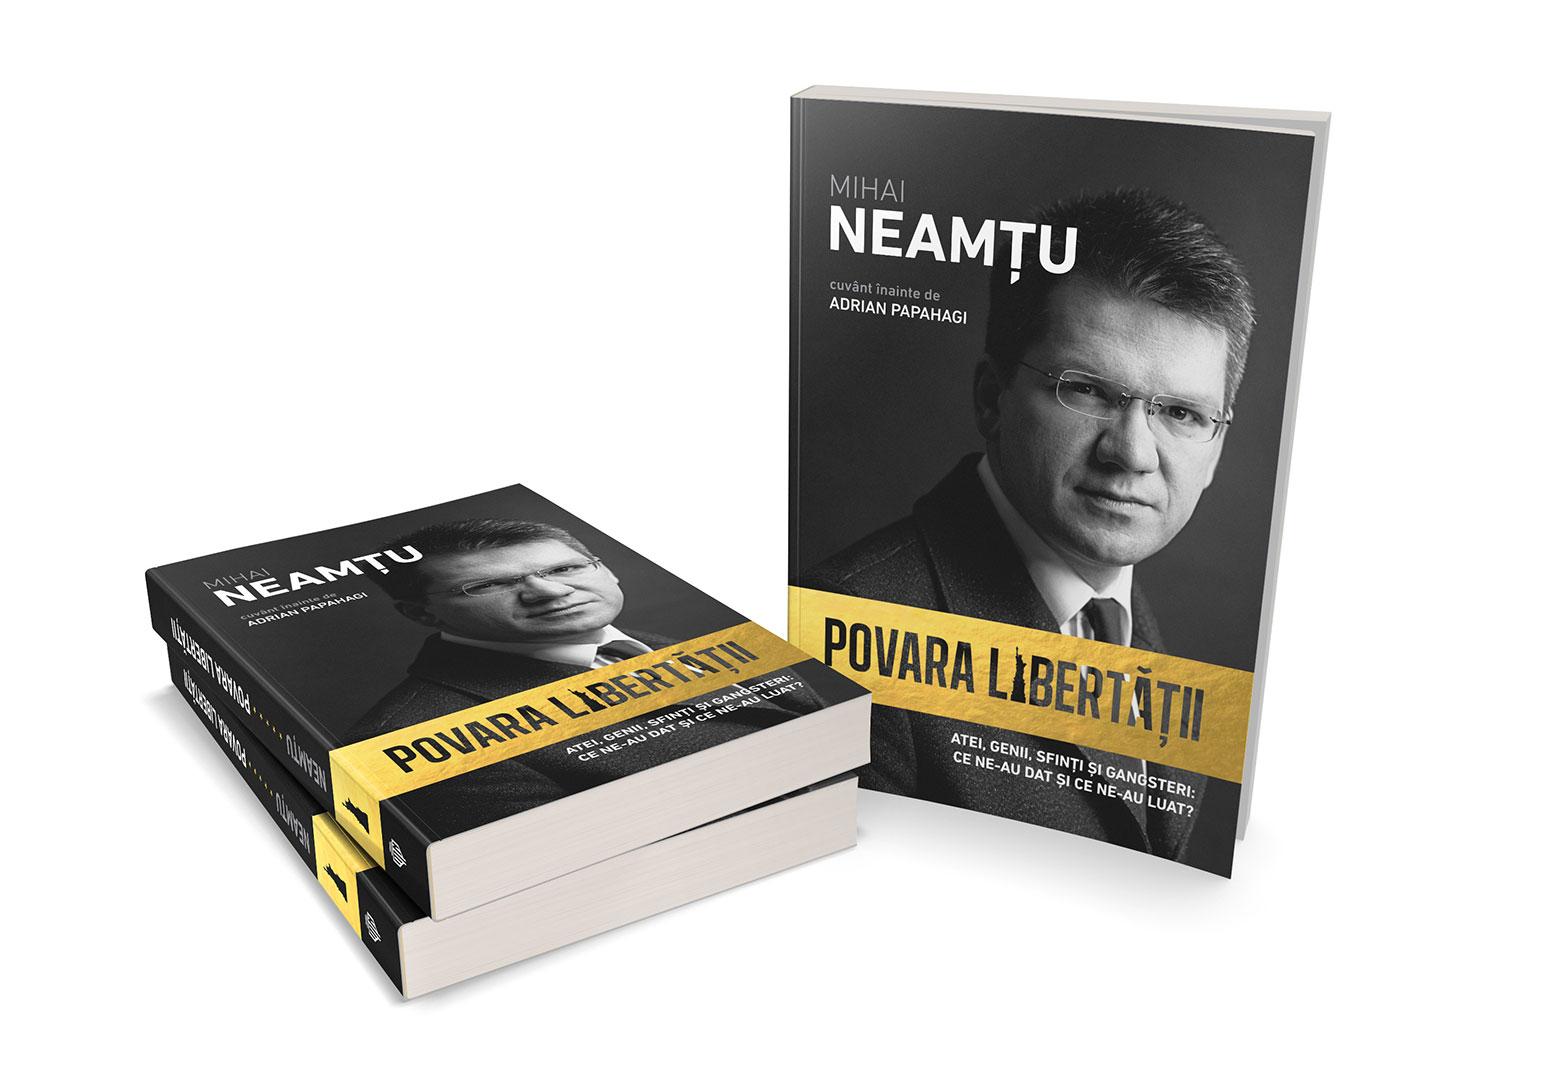 Povara Libertatii, Mihai Neamtu, Carte